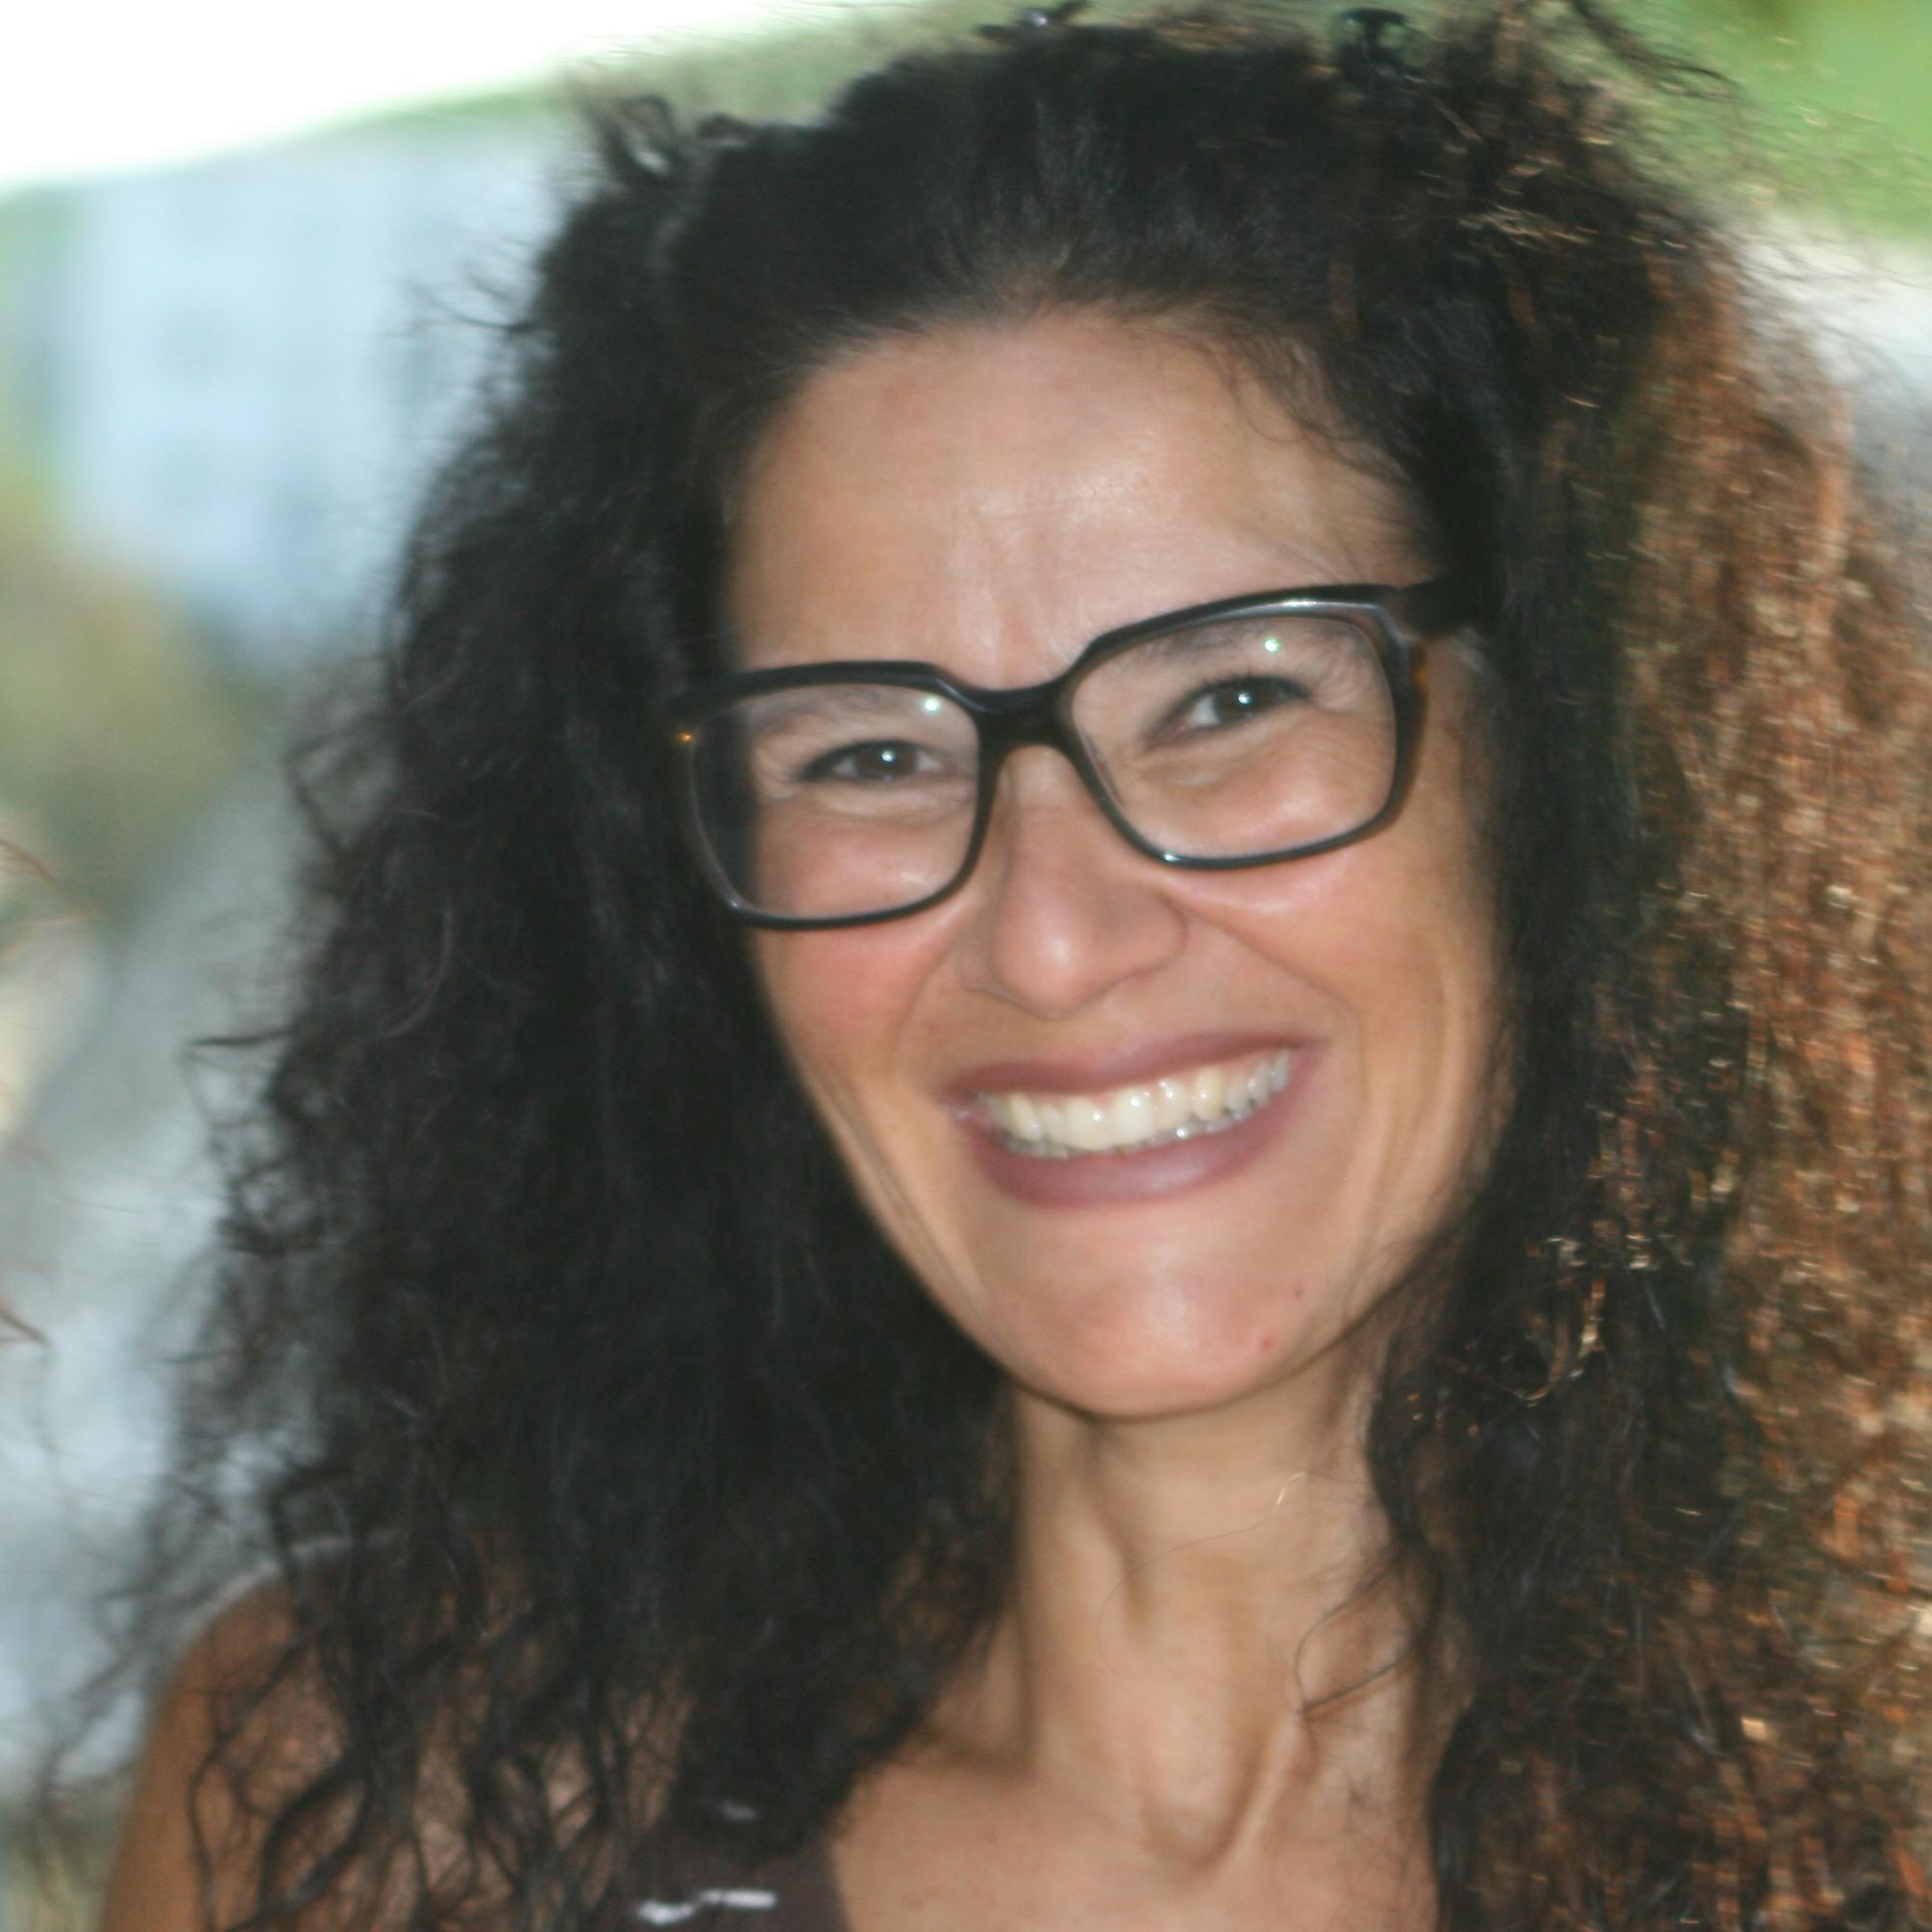 Corinne Rankl